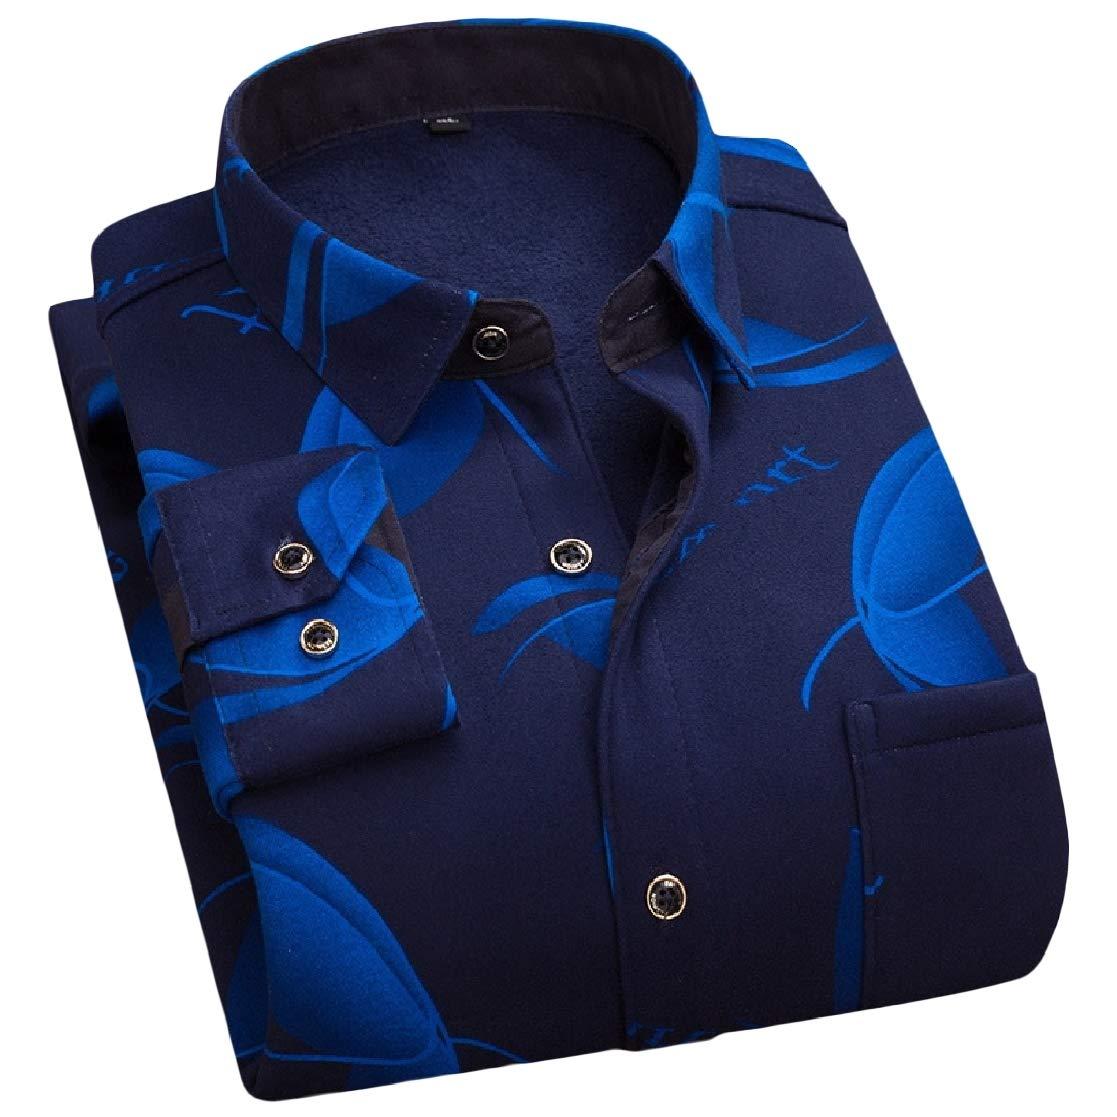 YUNY Mens Office Plaid Thickening Comfort Plus Velvet Dress Shirt Pattern19 M